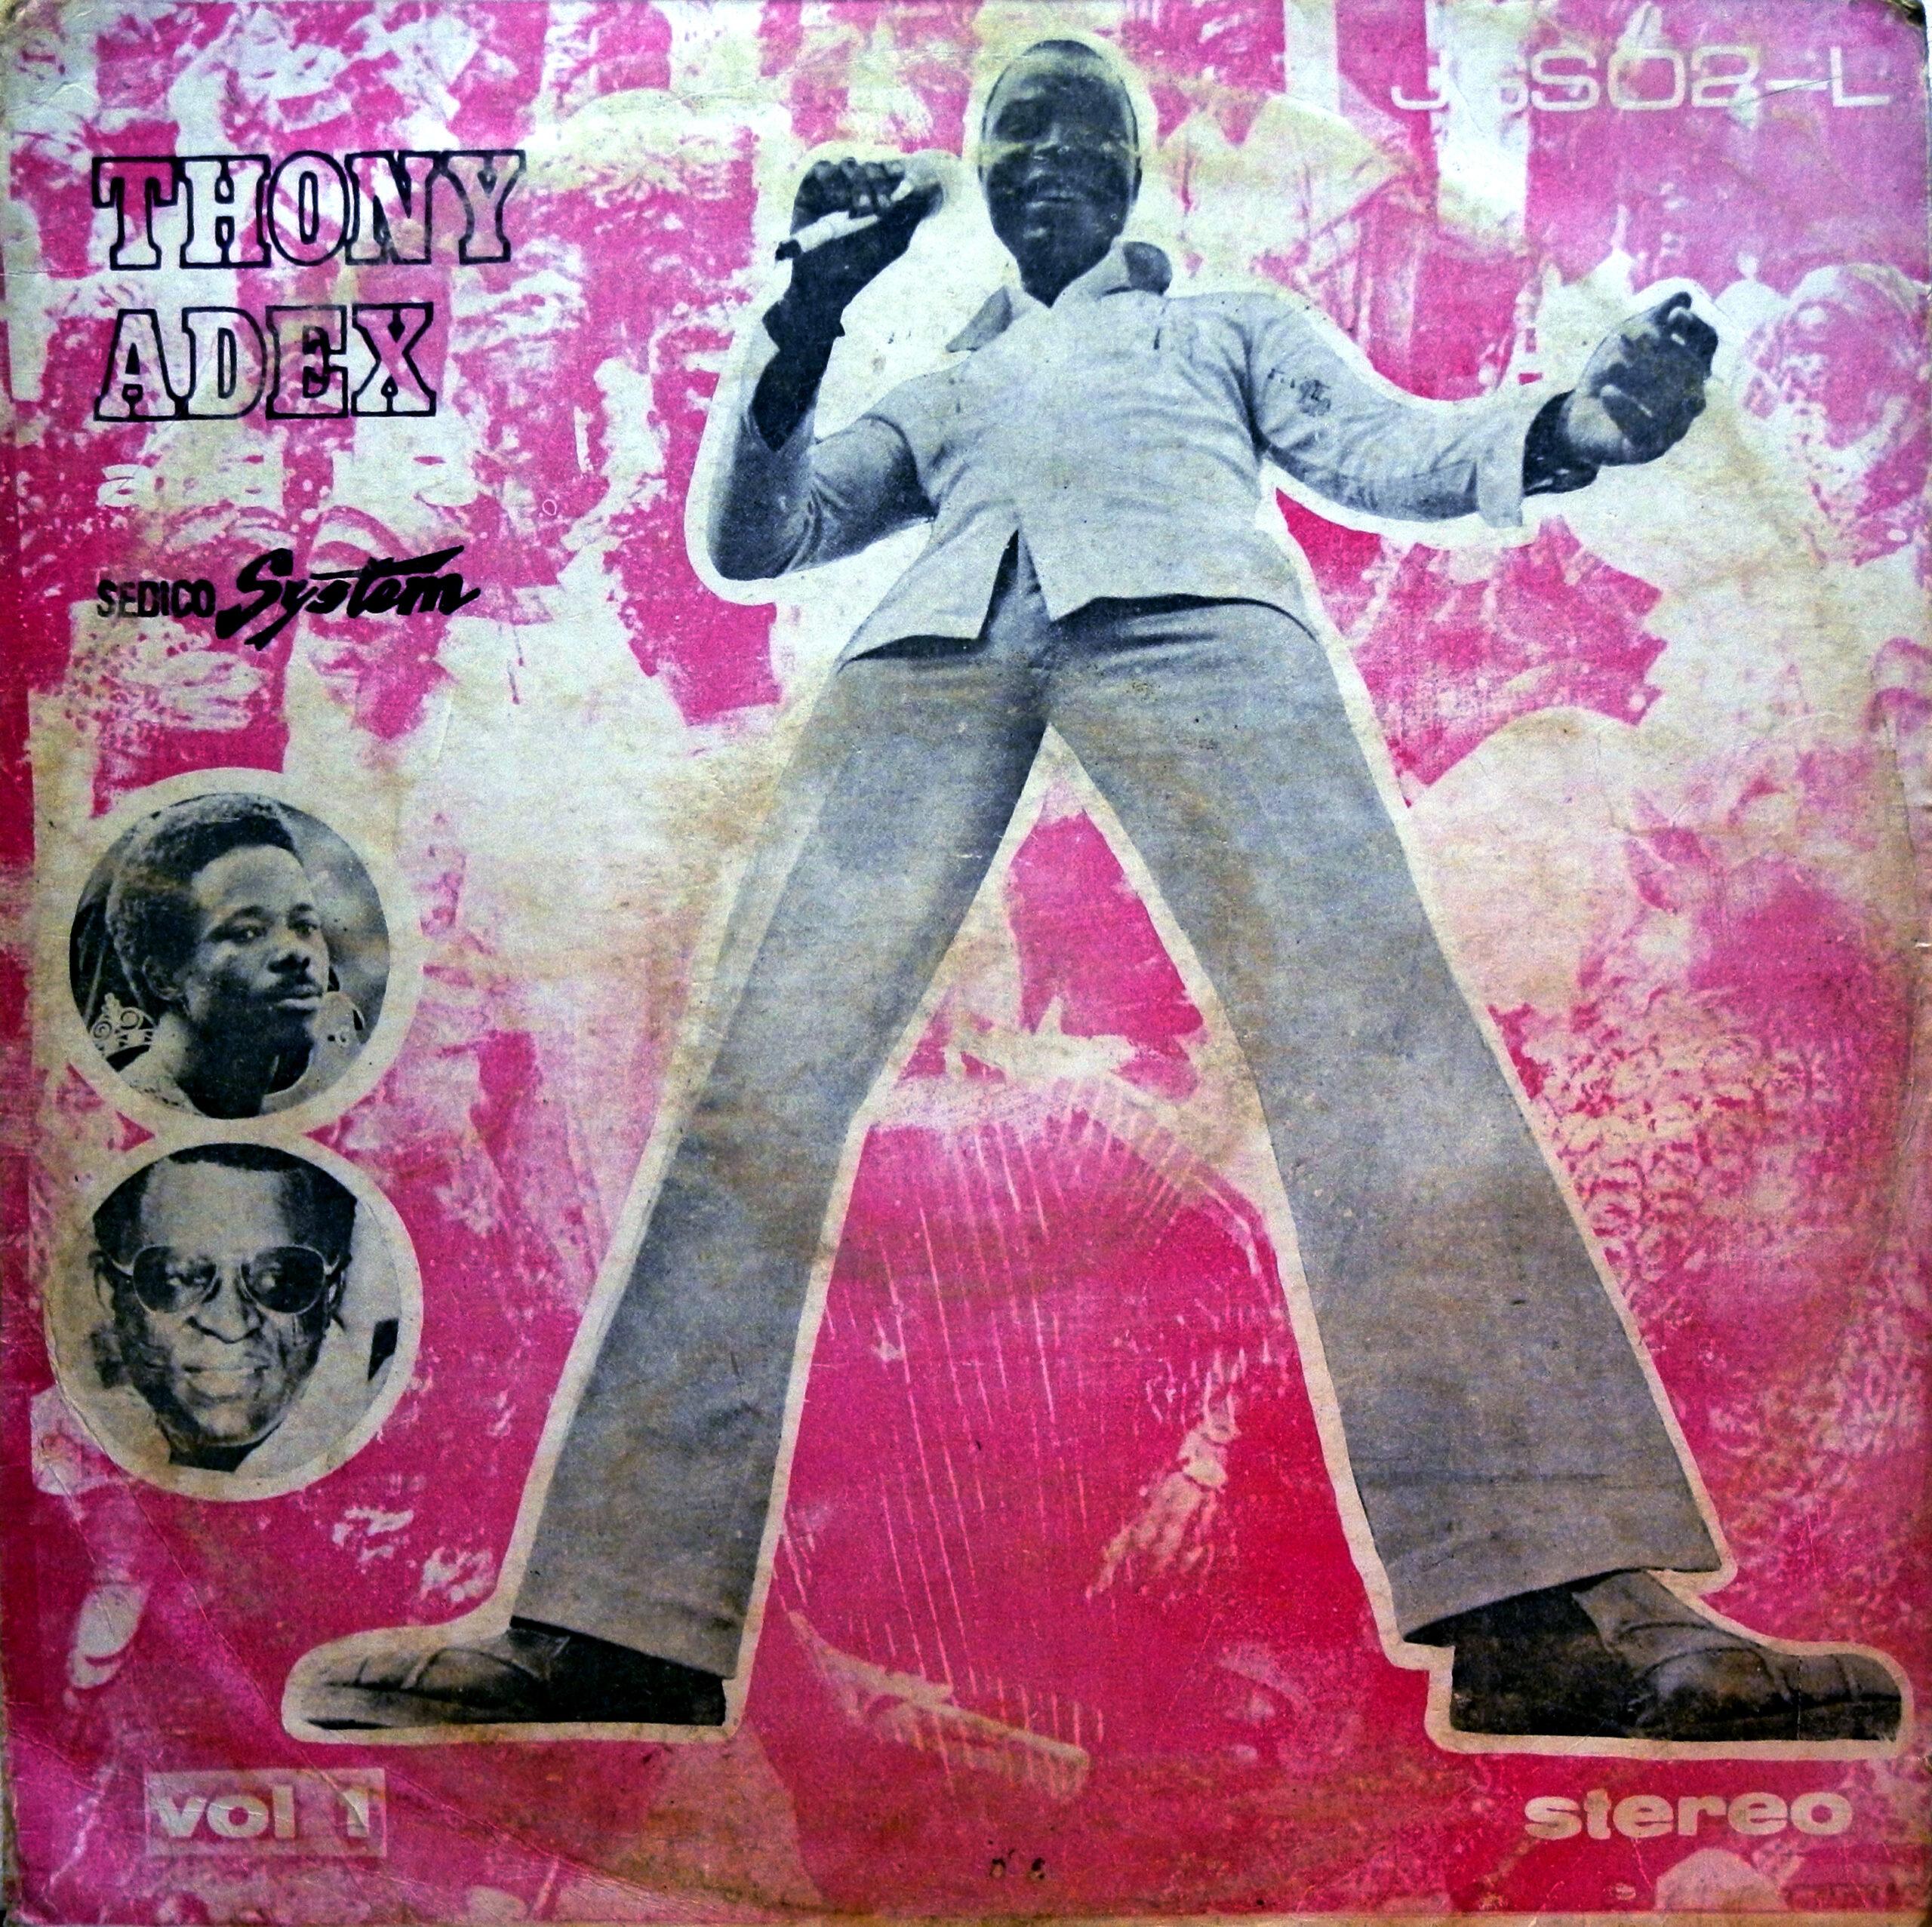 Thony Adex And His Sedico System – Vol. 1 70's NIGERIAN Yoruba Juju Music ALBUM LP